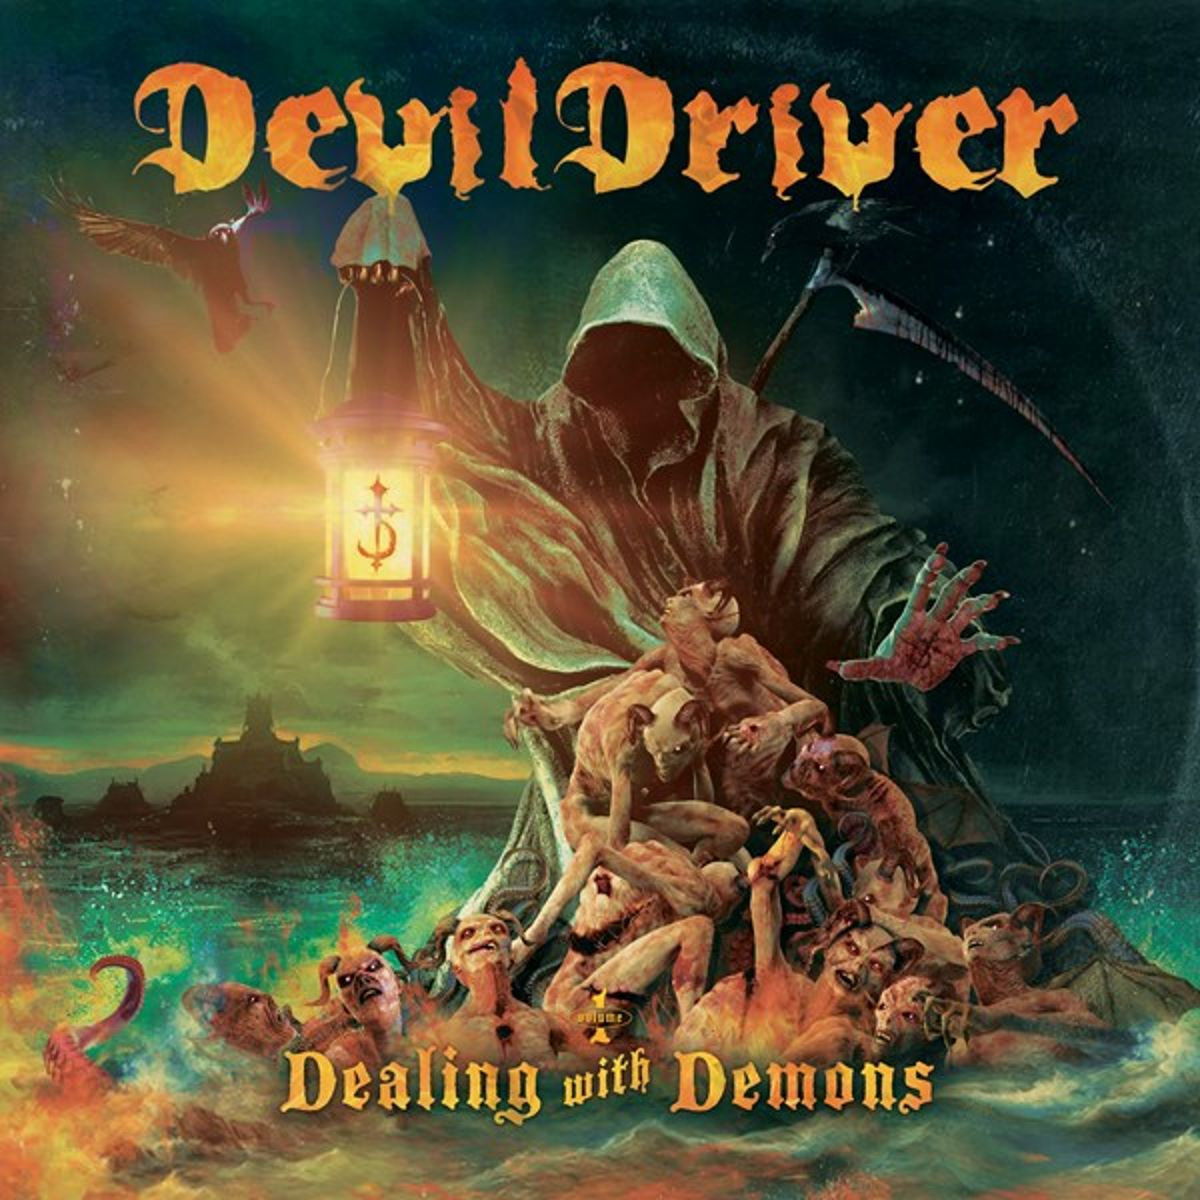 DEVILDRIVER - Dealing With Demons I - album cover